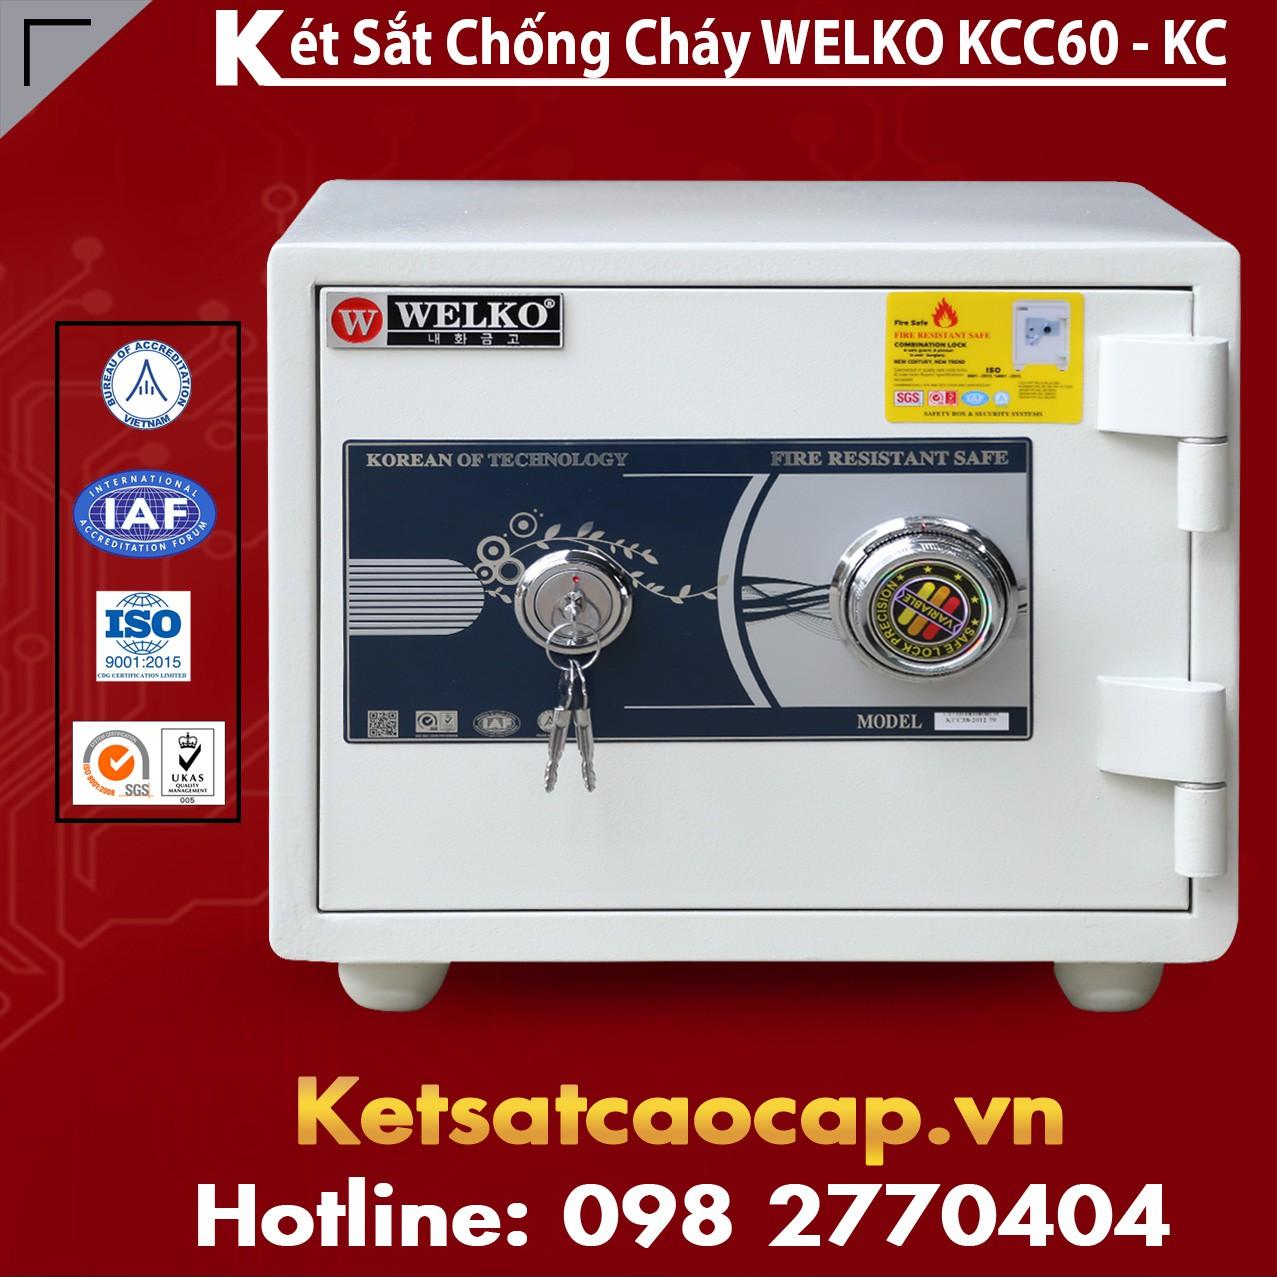 Mua Két Sắt KCC60 White - KC